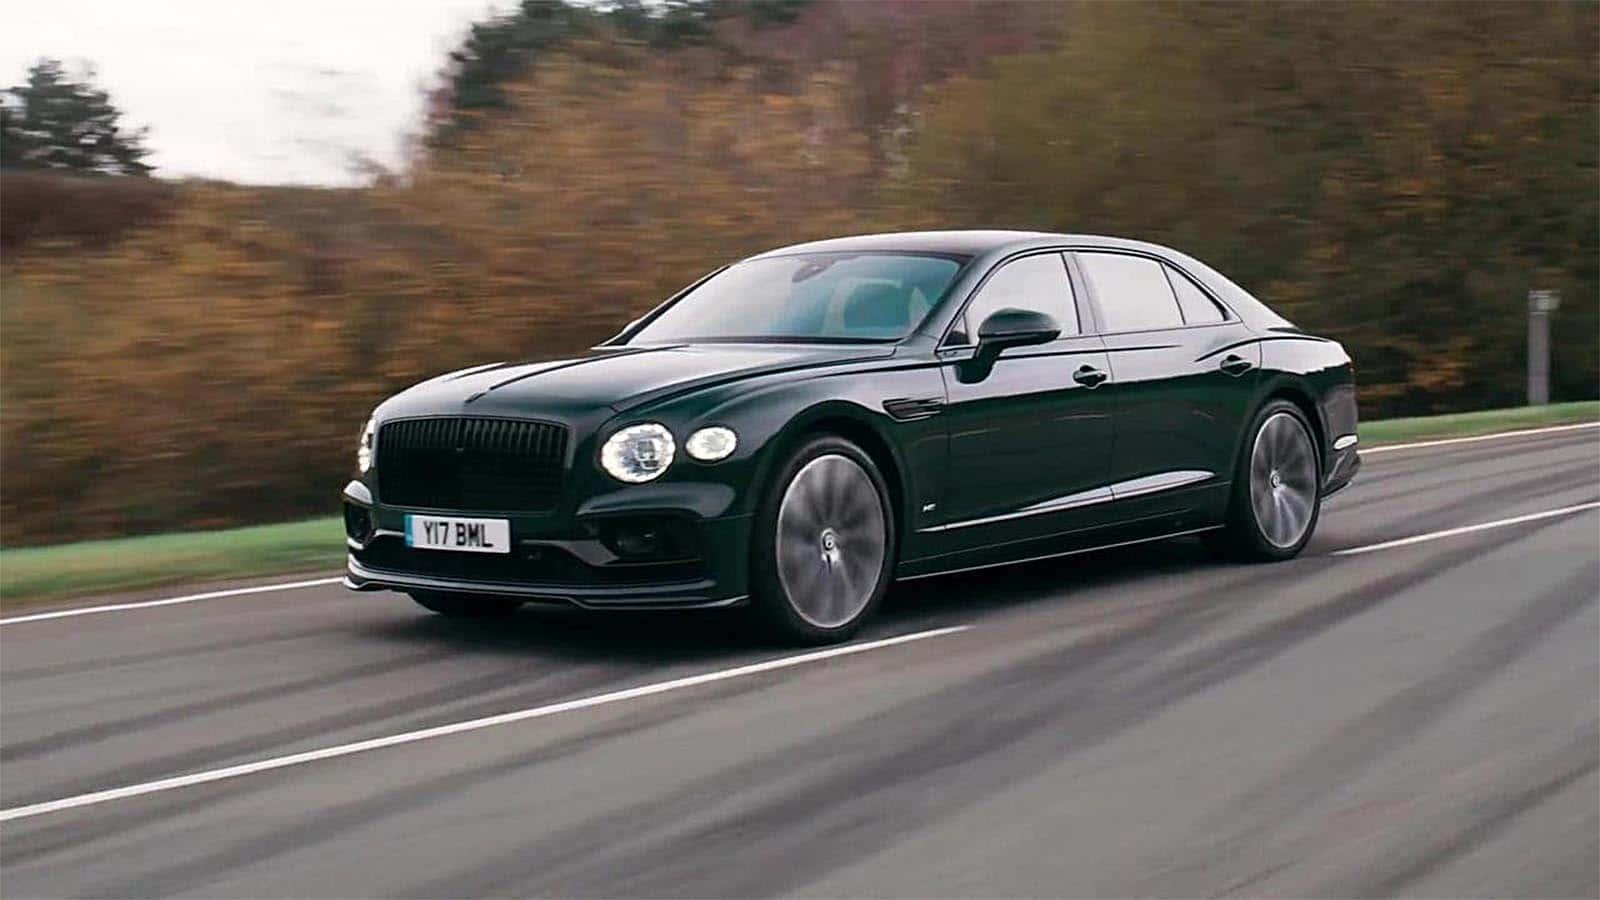 A Week With: 2021 Bentley Flying Spur V8 in Barnato - The Detroit Bureau